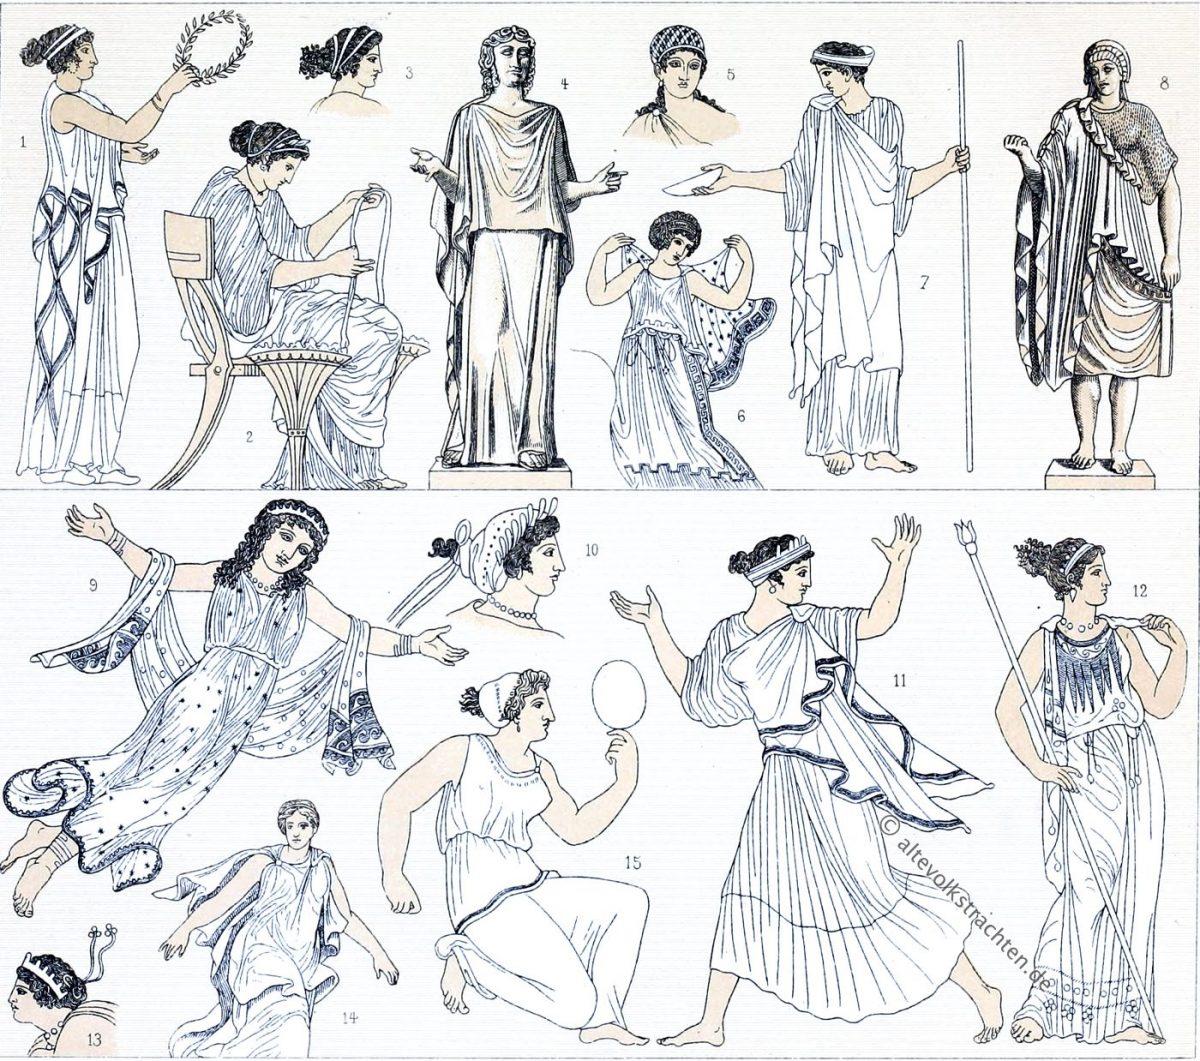 Endymata, Epiblemata, Antike, Griechenland, Kostümgeschichte, Modegeschichte